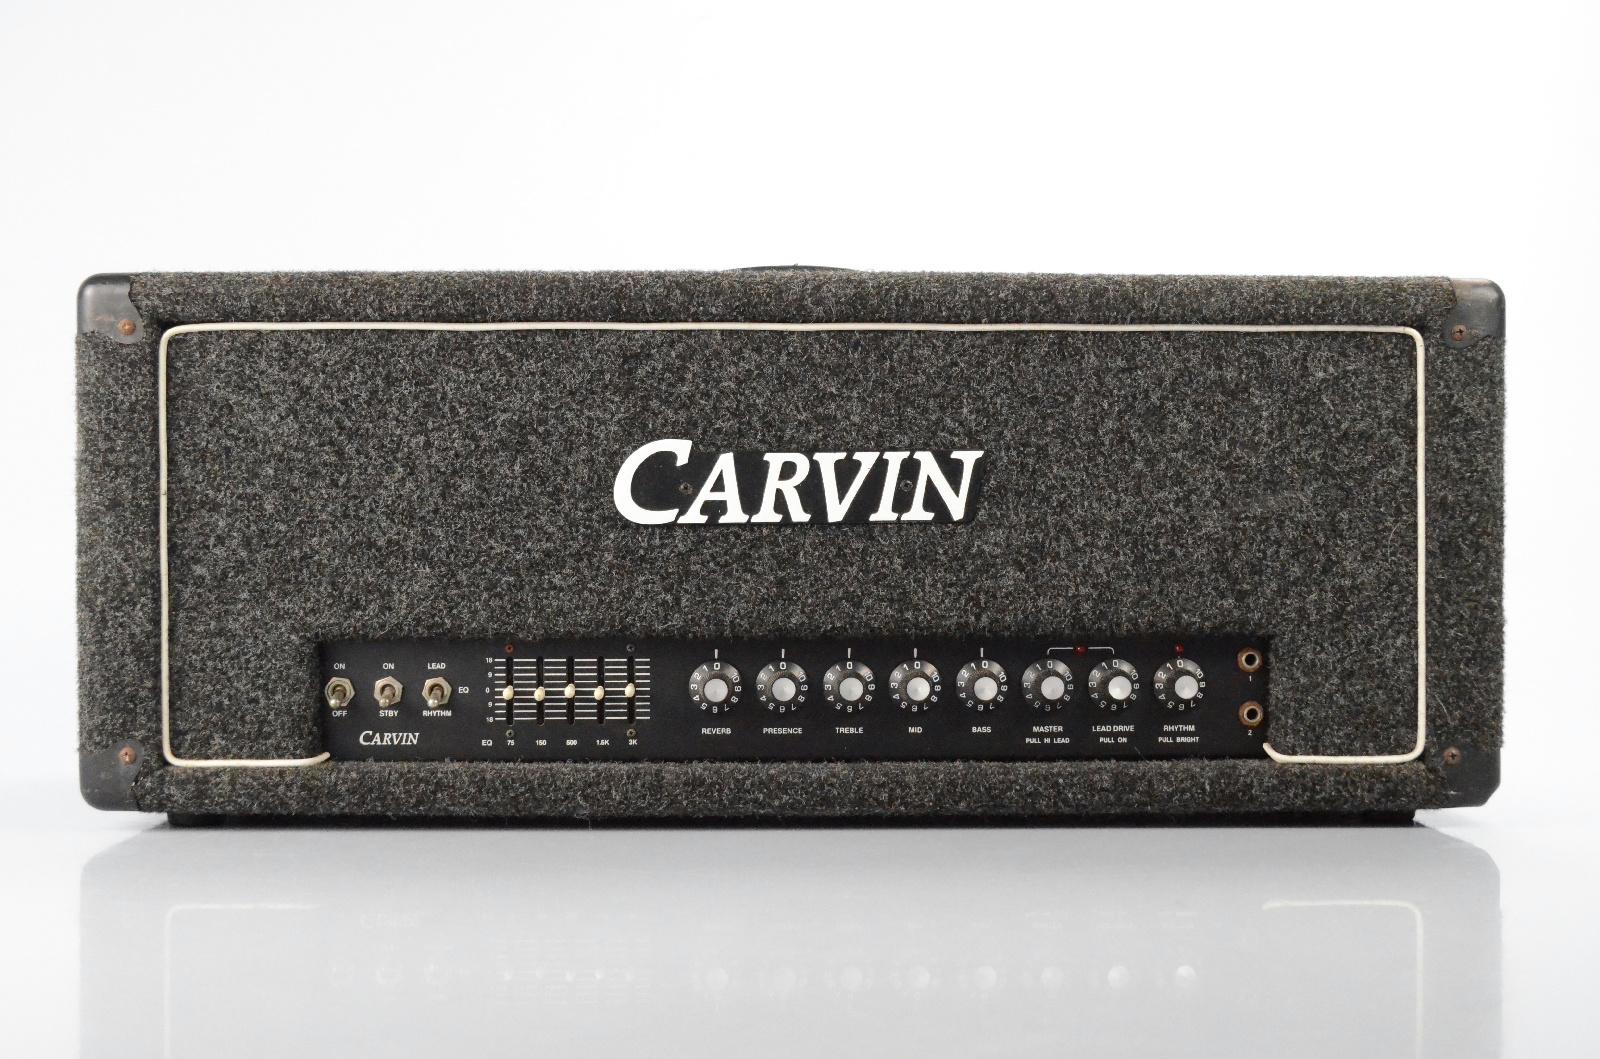 Carvin X-100B Hot Rod Mod 100W Tube Guitar Amp Head w/ Foot Switch X100B #32689